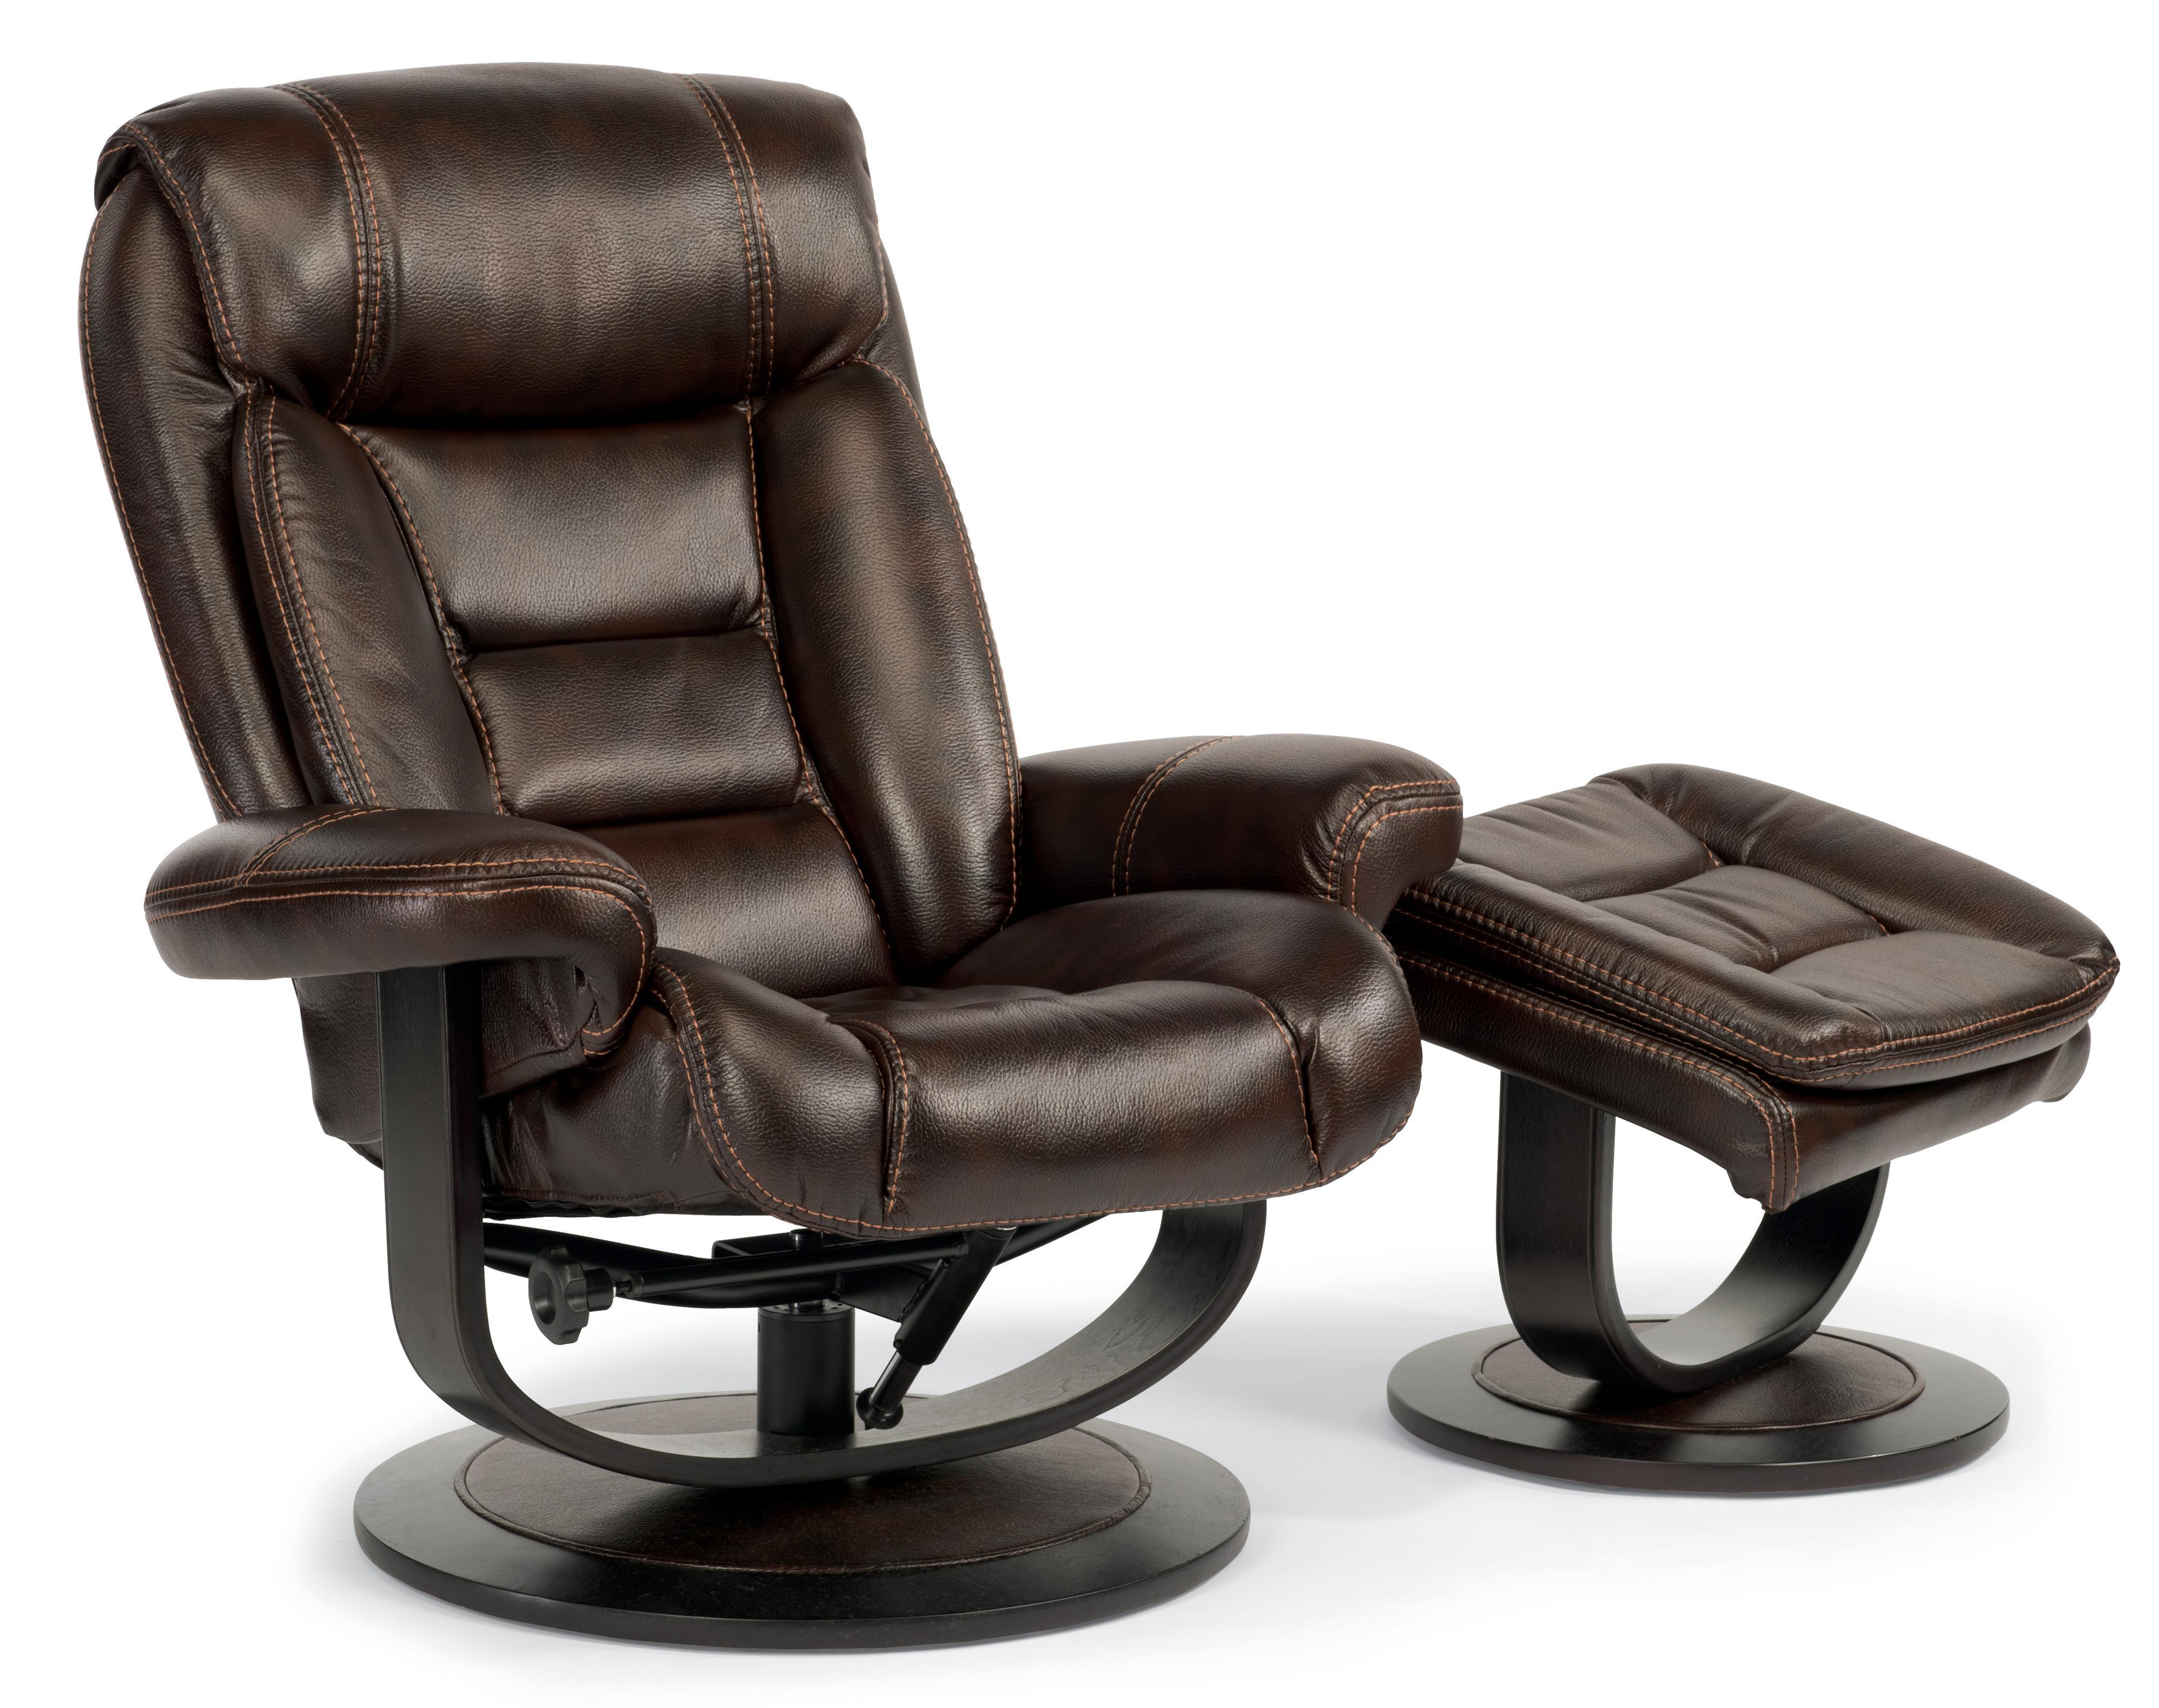 reclining chair and ottoman pedrali queen flexsteel latitudes hunter 1454 co modern zero gravity